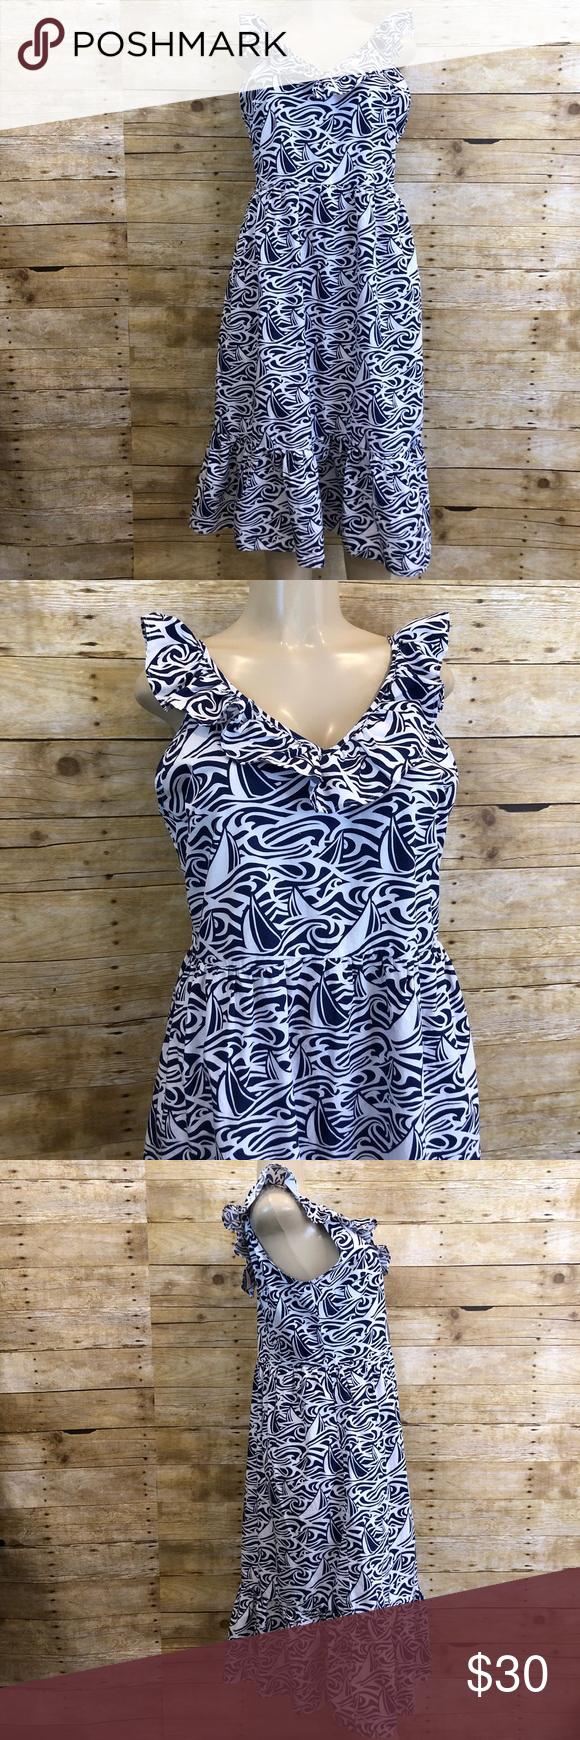 Vineyard Vines Rough Seas Midi Dress Xl Midi Dress Clothes Design Dresses [ 1740 x 580 Pixel ]